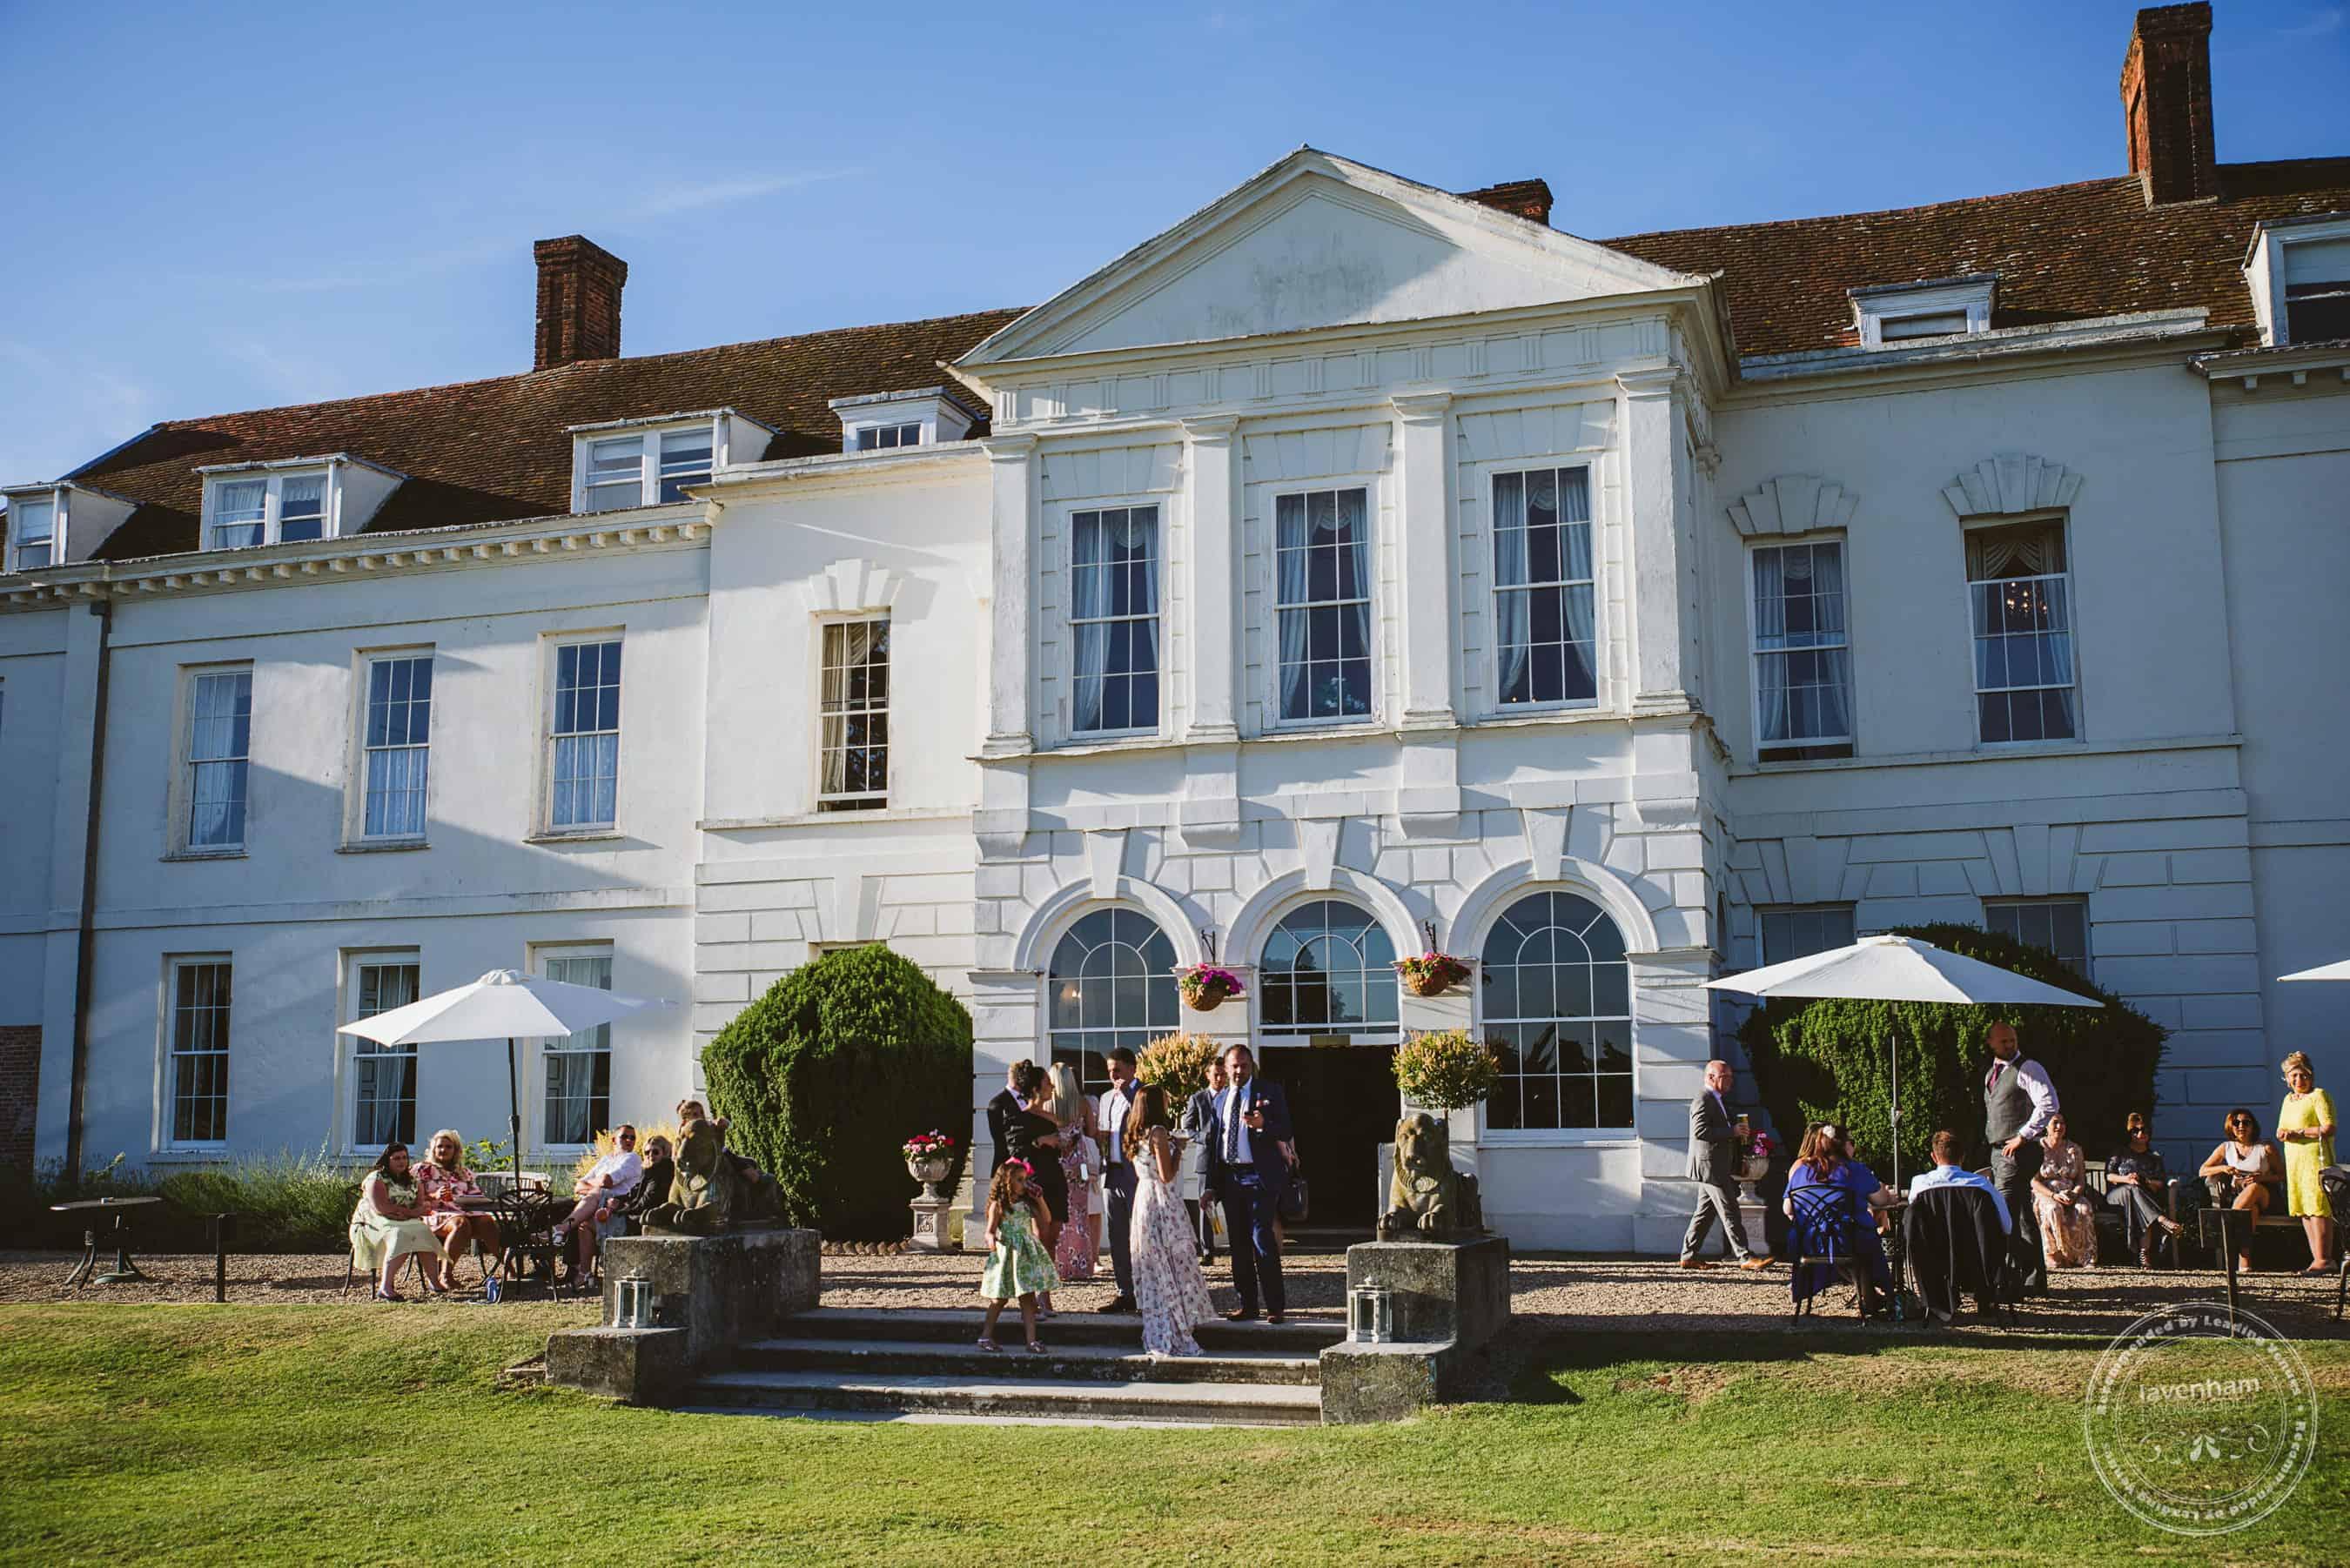 220618 Gosfield Hall Wedding Photography Lavenham Photographic 0148